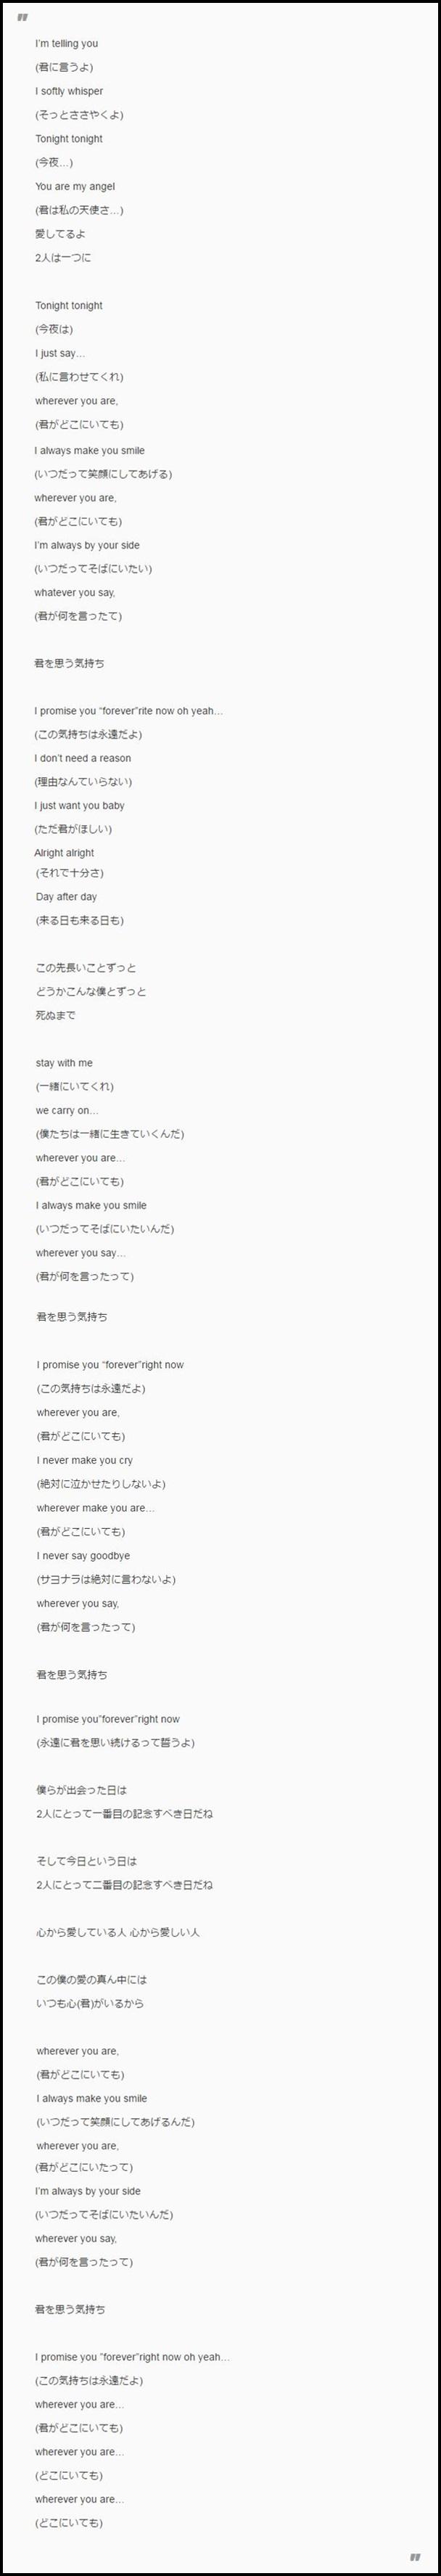 ONE OK ROCK wherever You areの歌詞と和訳!結婚式に聞きたい名曲?歌詞画像